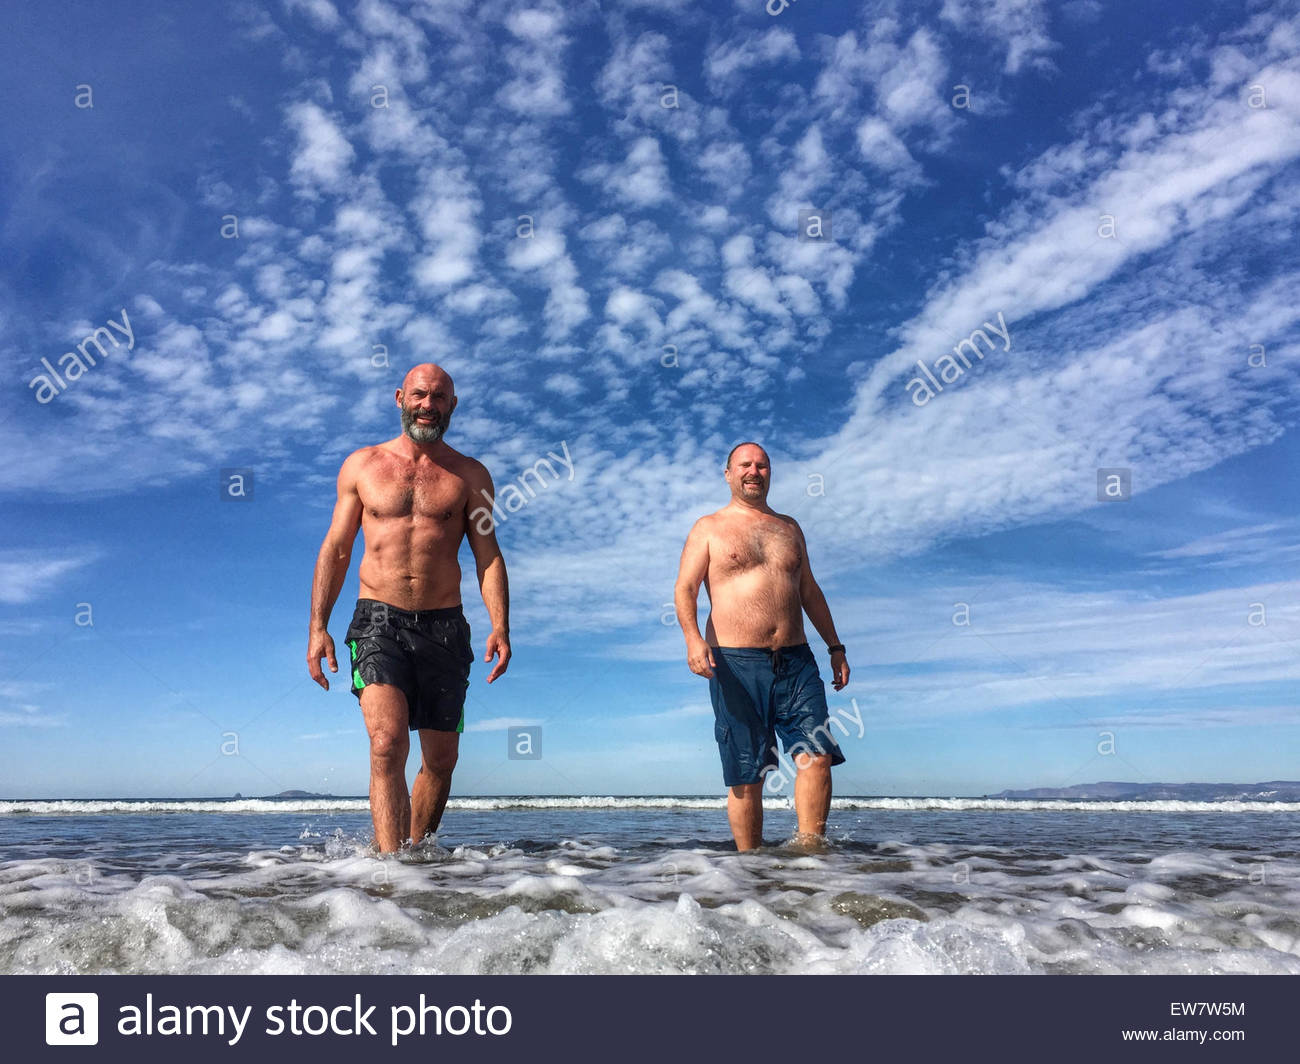 Two men walking out of the ocean, Ensenada, Mexico - Stock Image